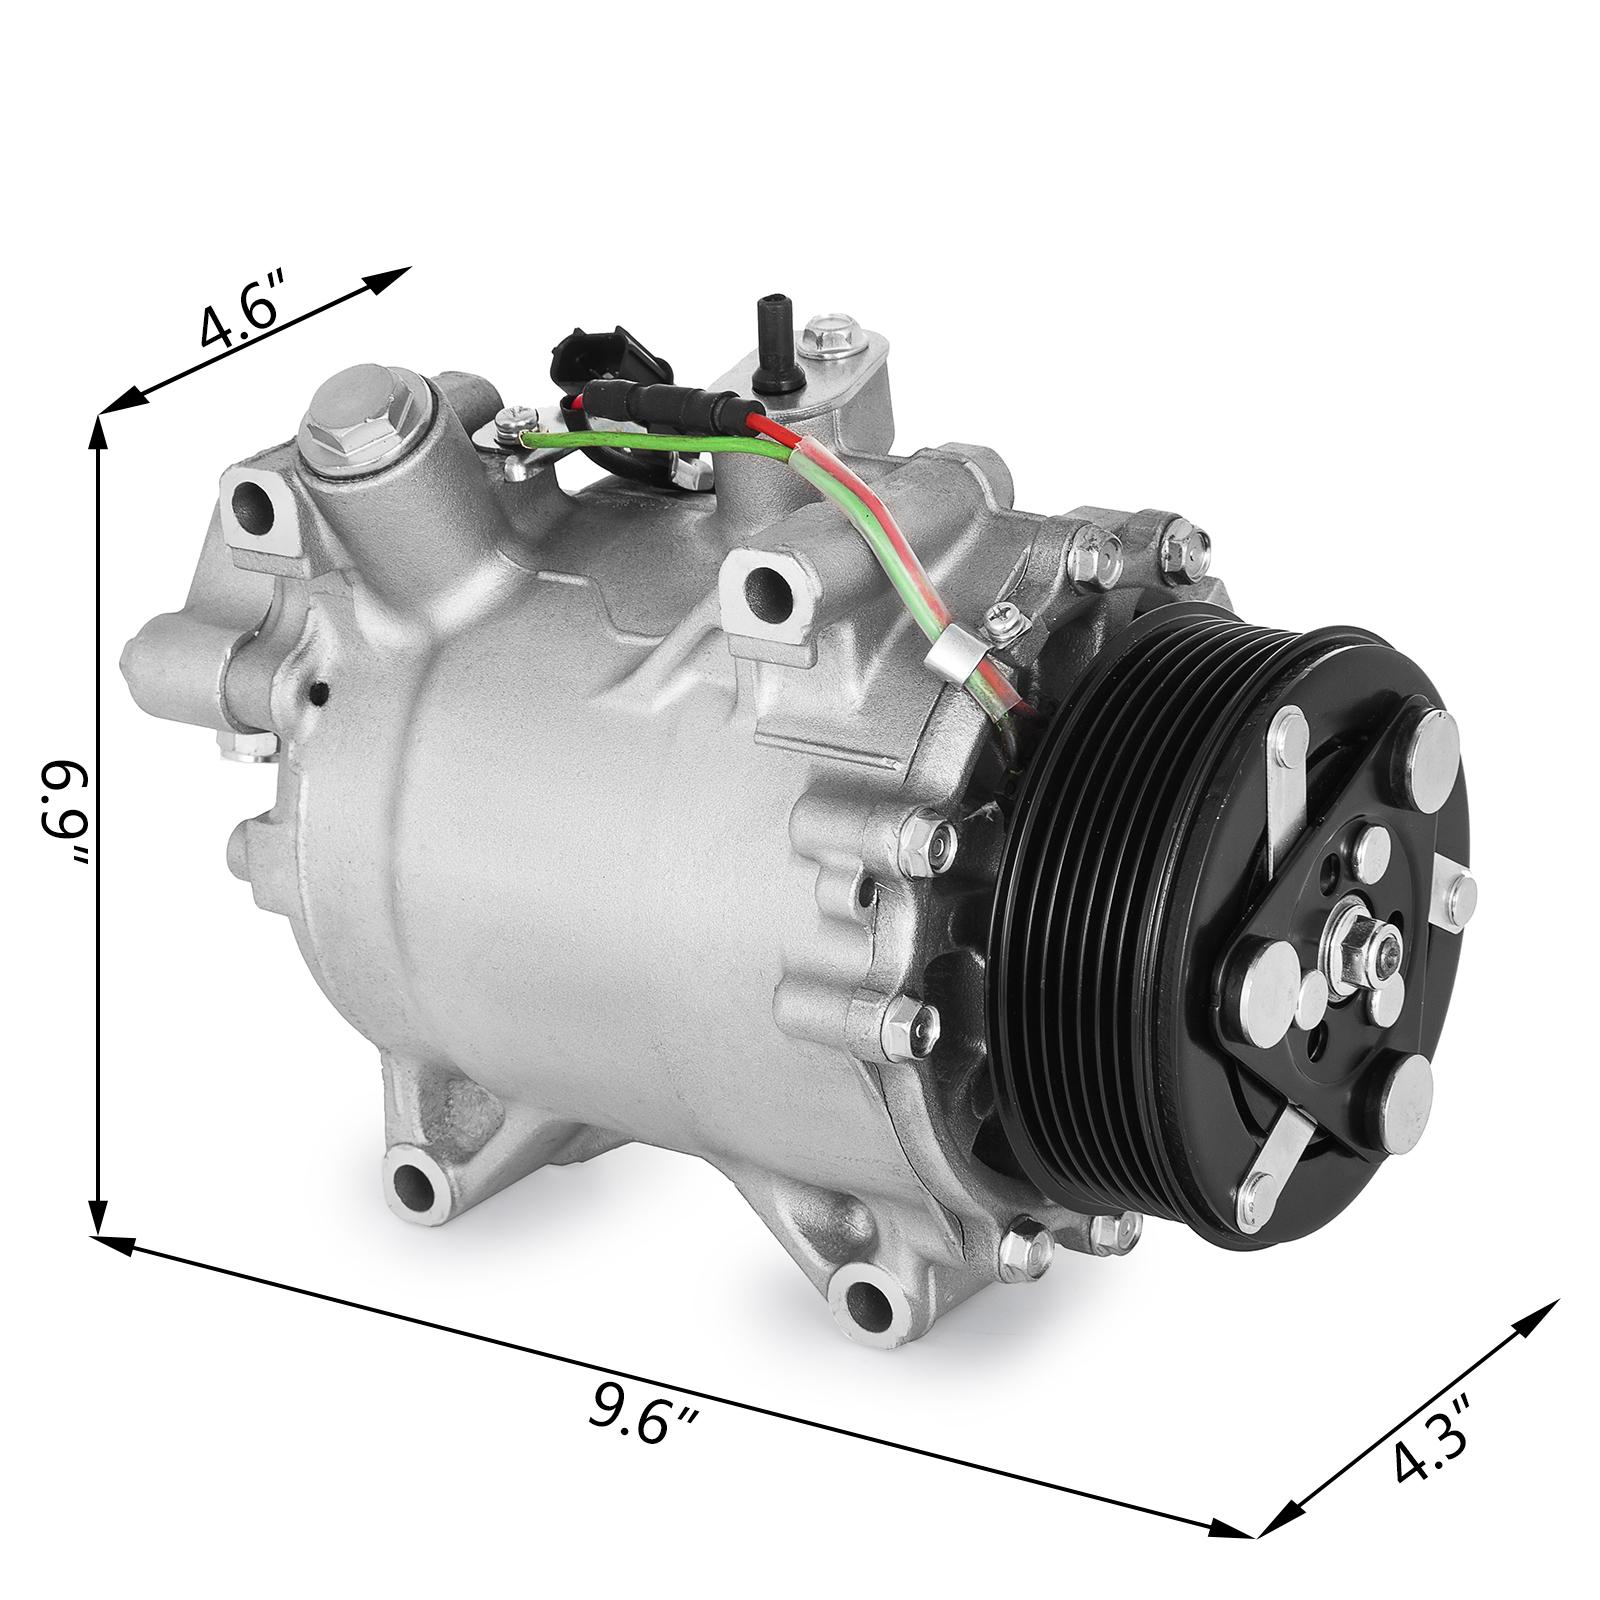 AC Compressor For 2007-2015 Fit Honda CRV 2.4L CO 4920AC